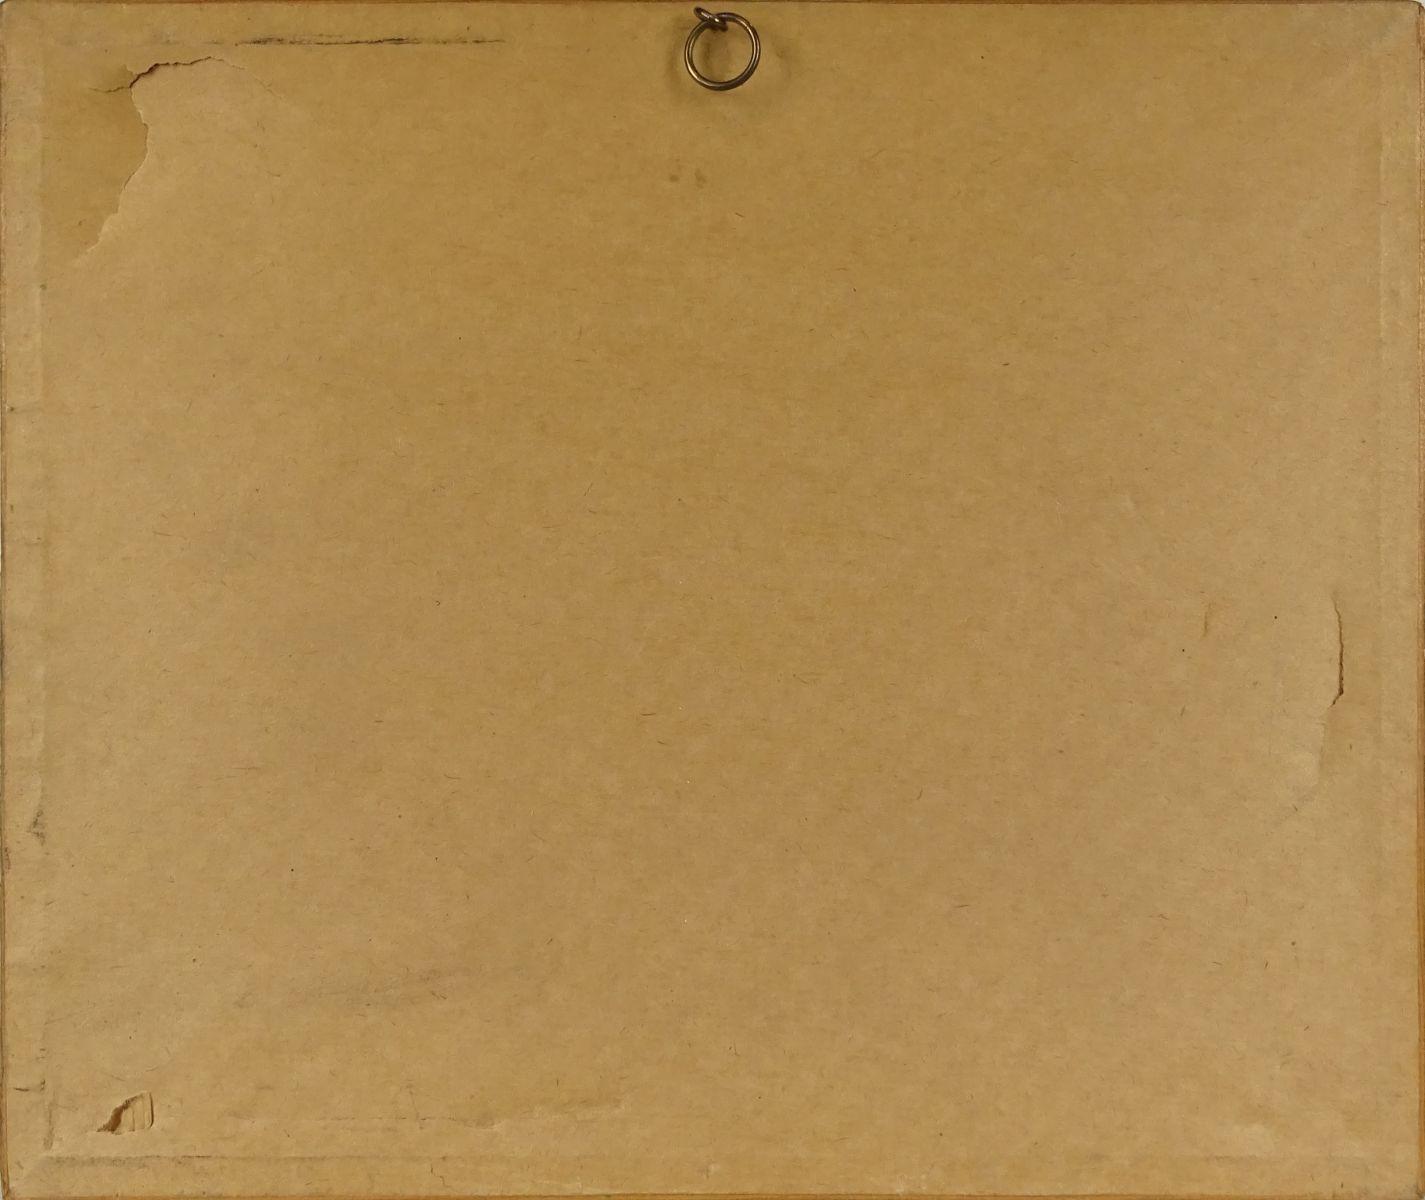 DSC08398.JPG (1425×1200)